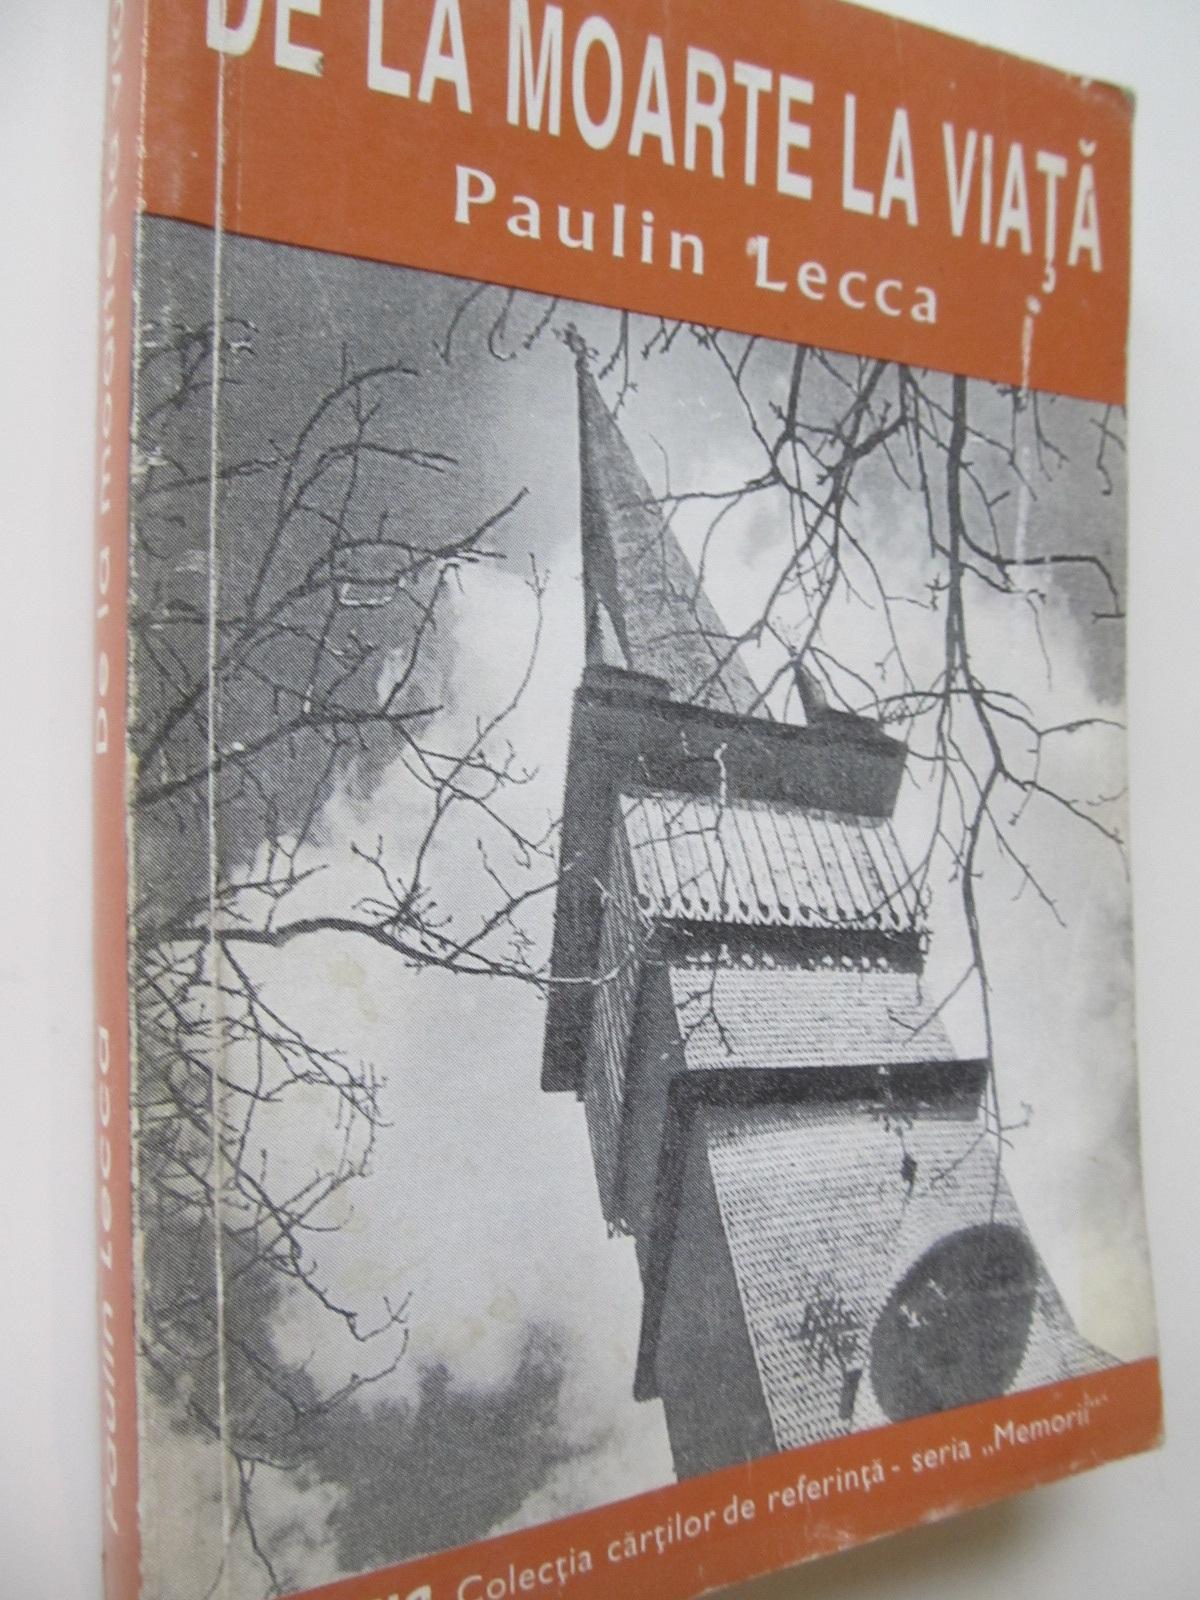 De la moarte la viata - Paulin Lecca | Detalii carte